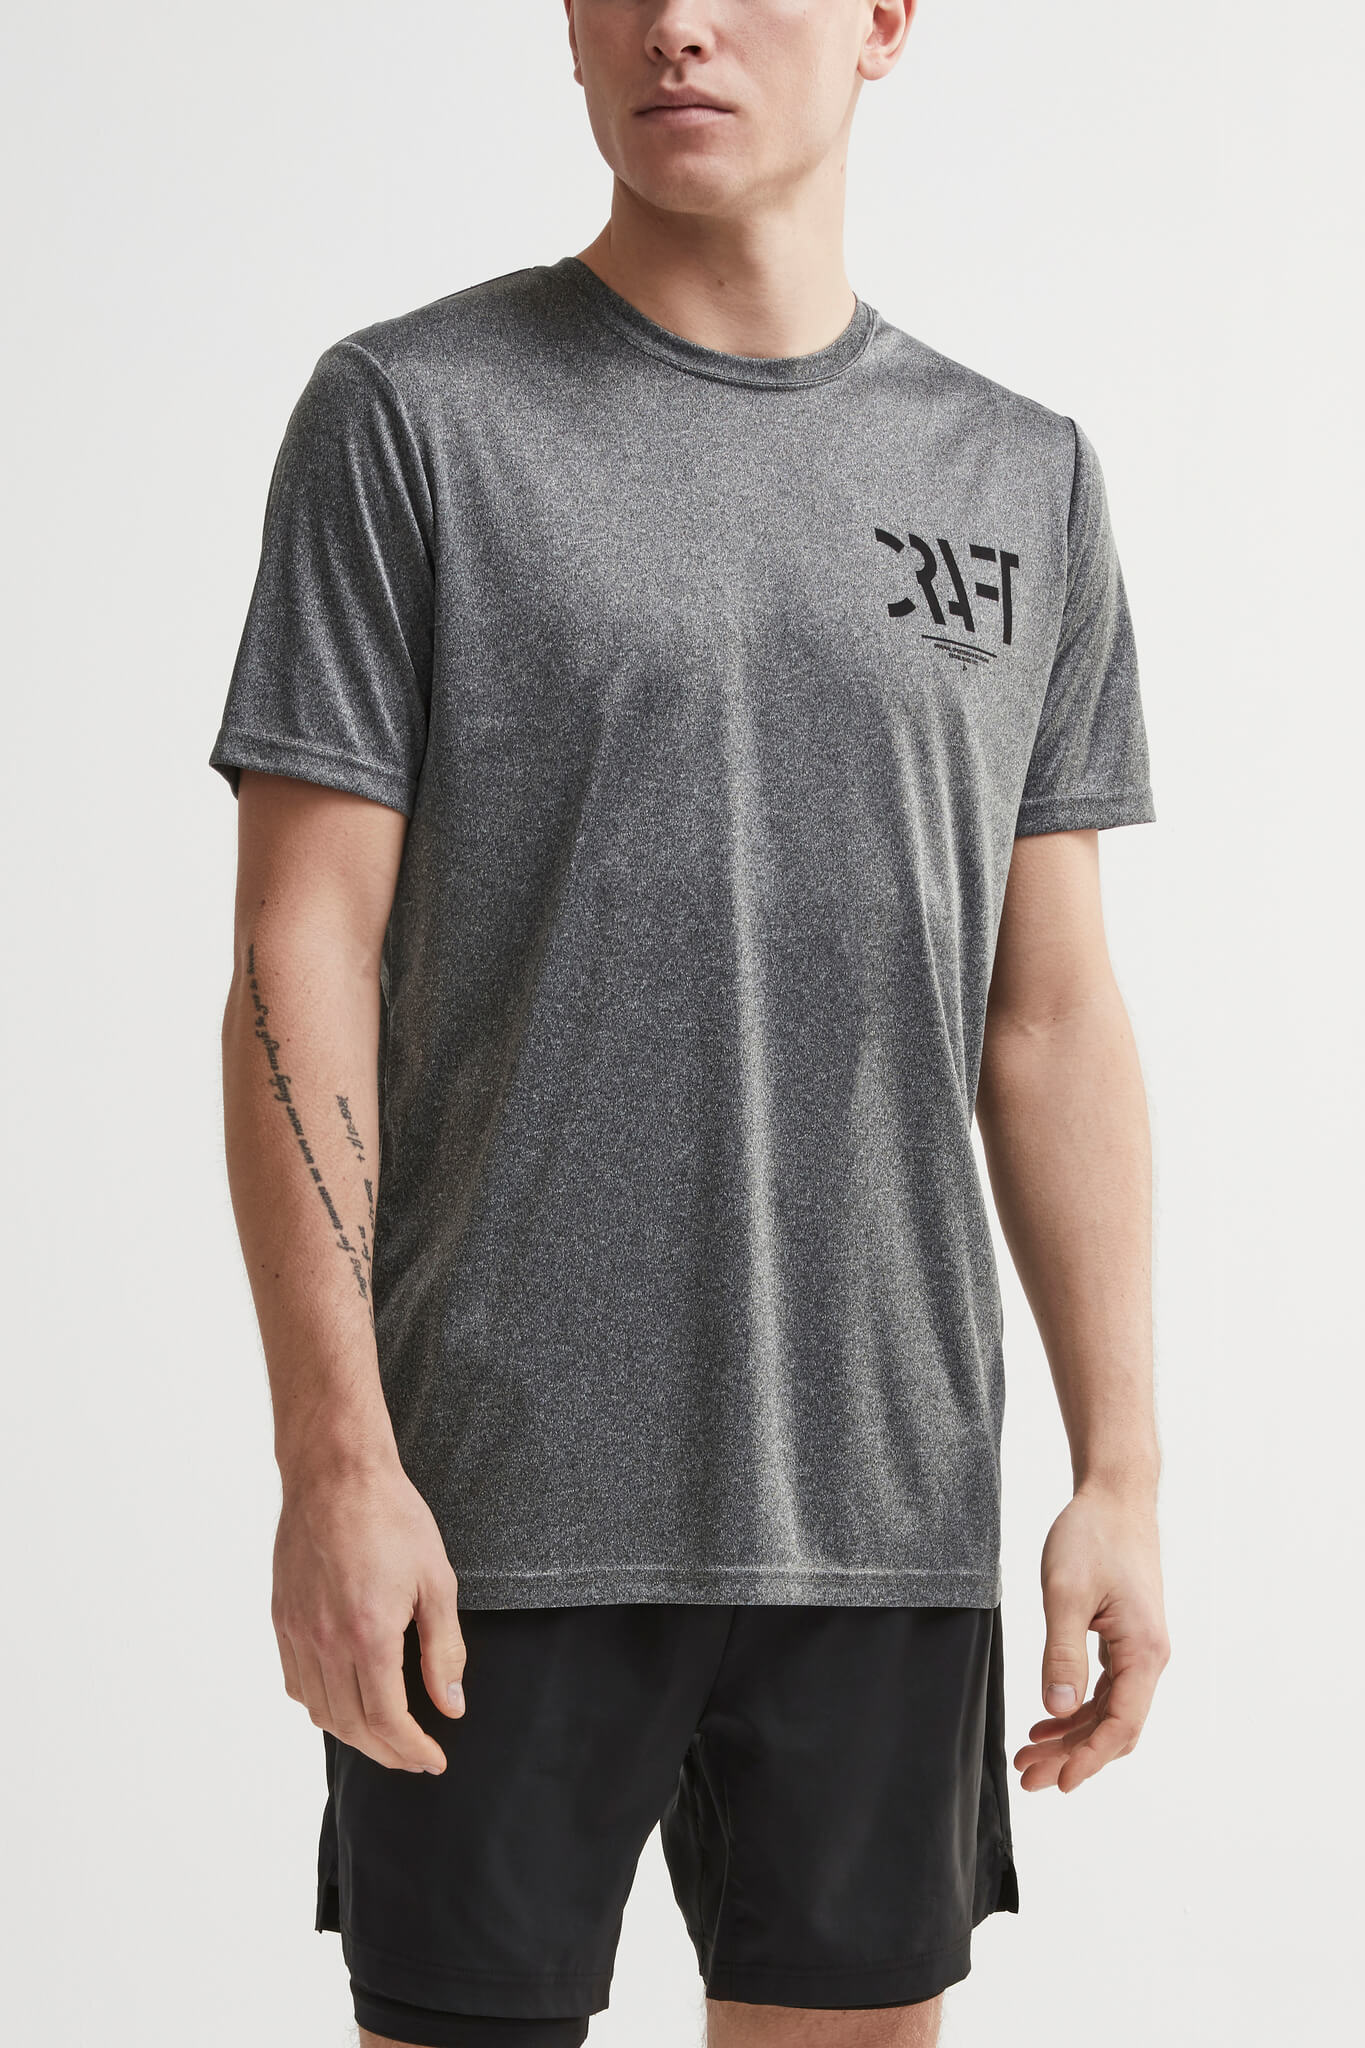 Craft Eaze SS Graghic футболка спортивная мужская grey - 2